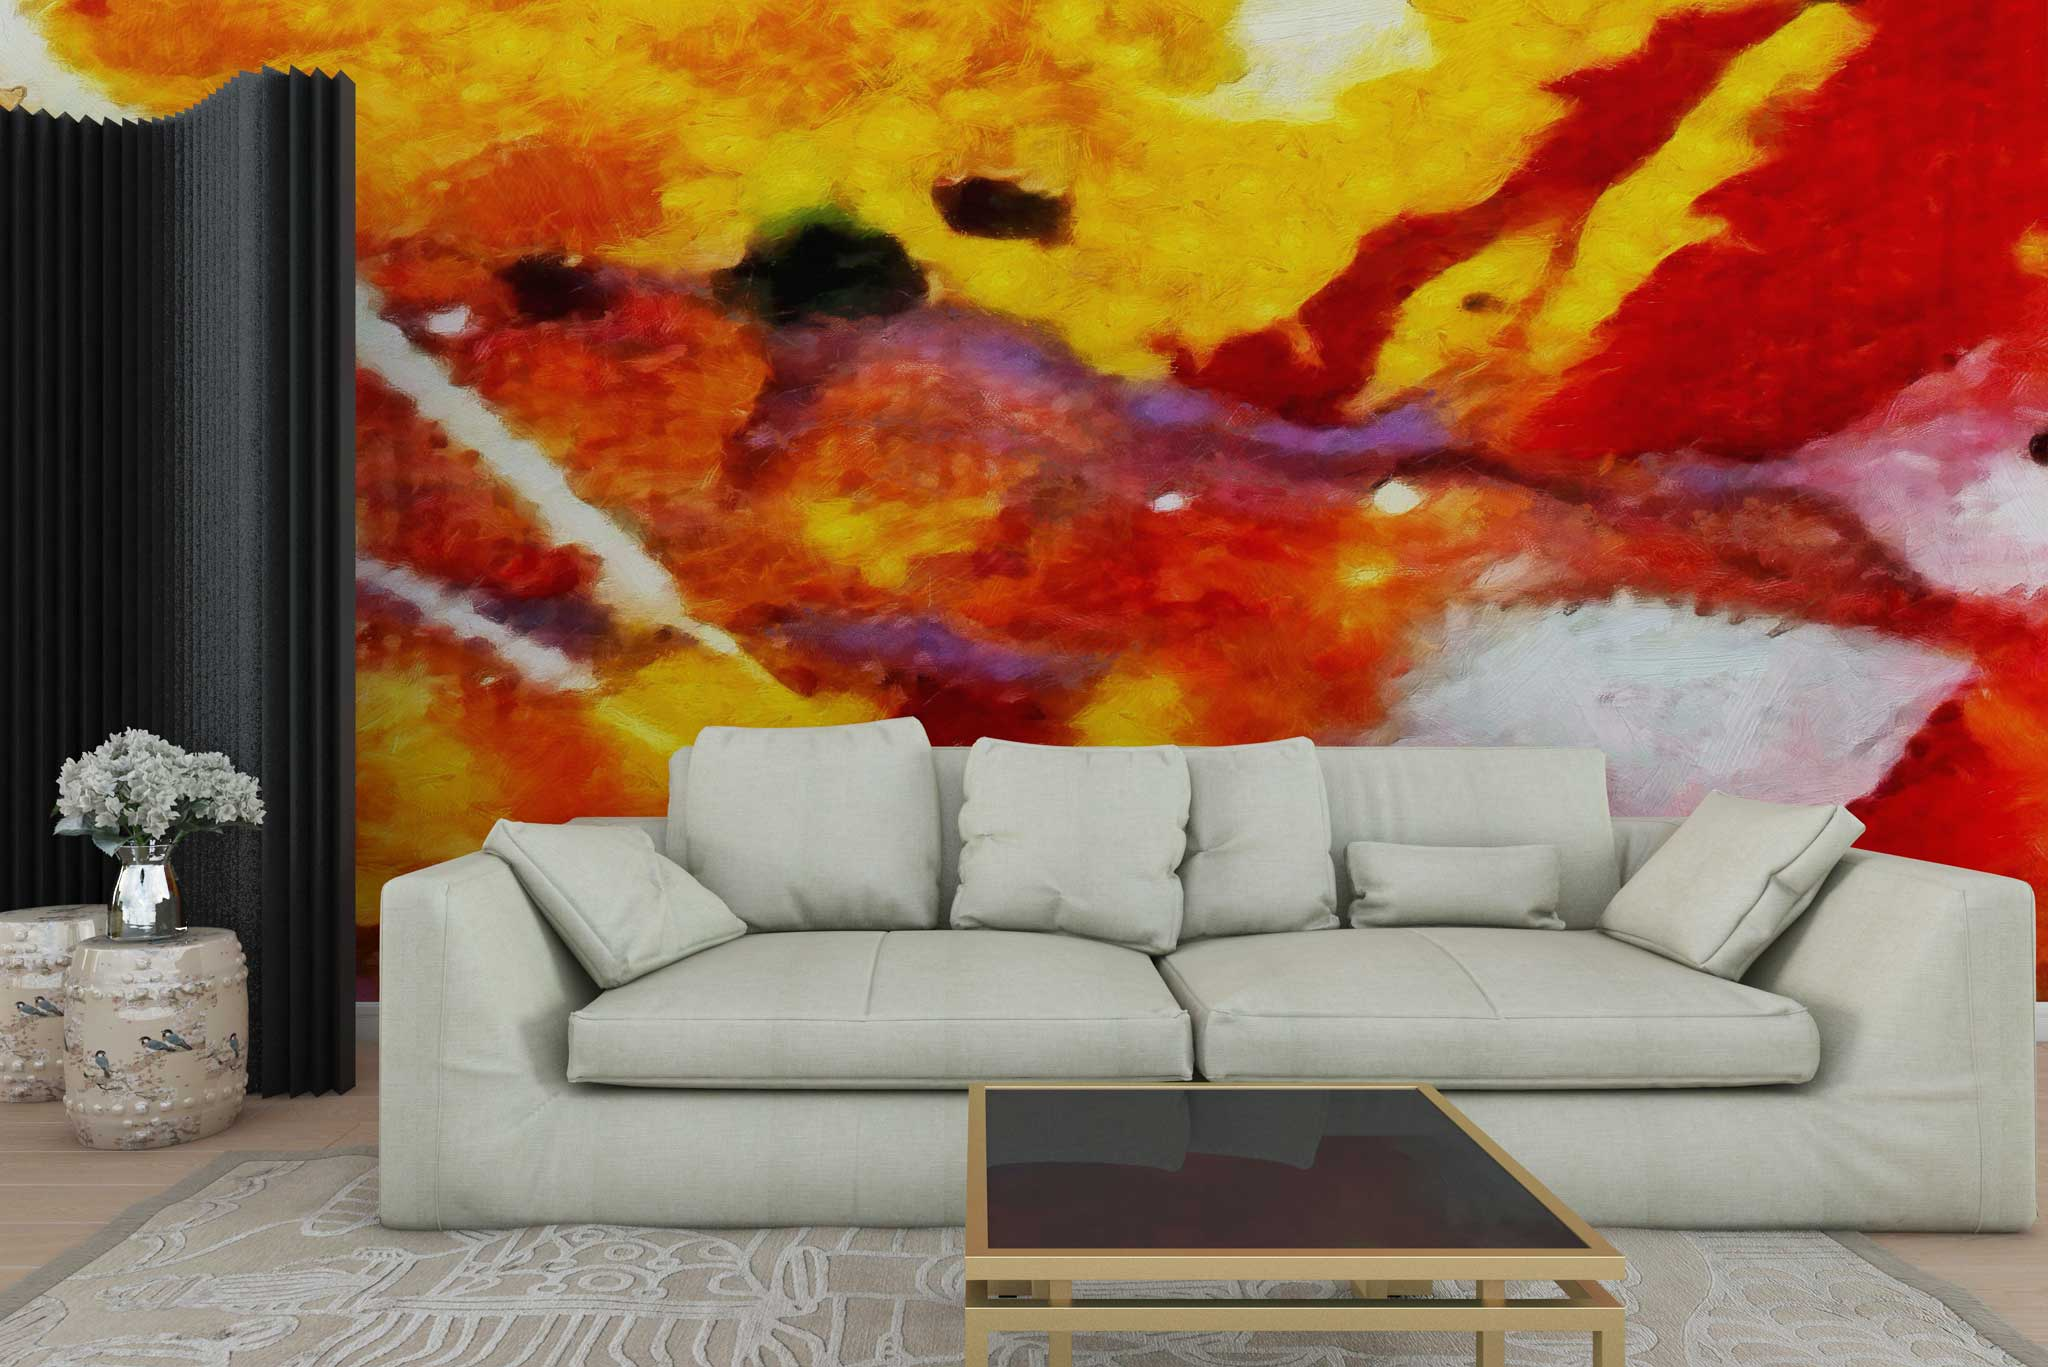 tapet-fototapet-personalizat-comanda-bucuresti-pictura-acuarela-abstract-rosuperete-lux-special